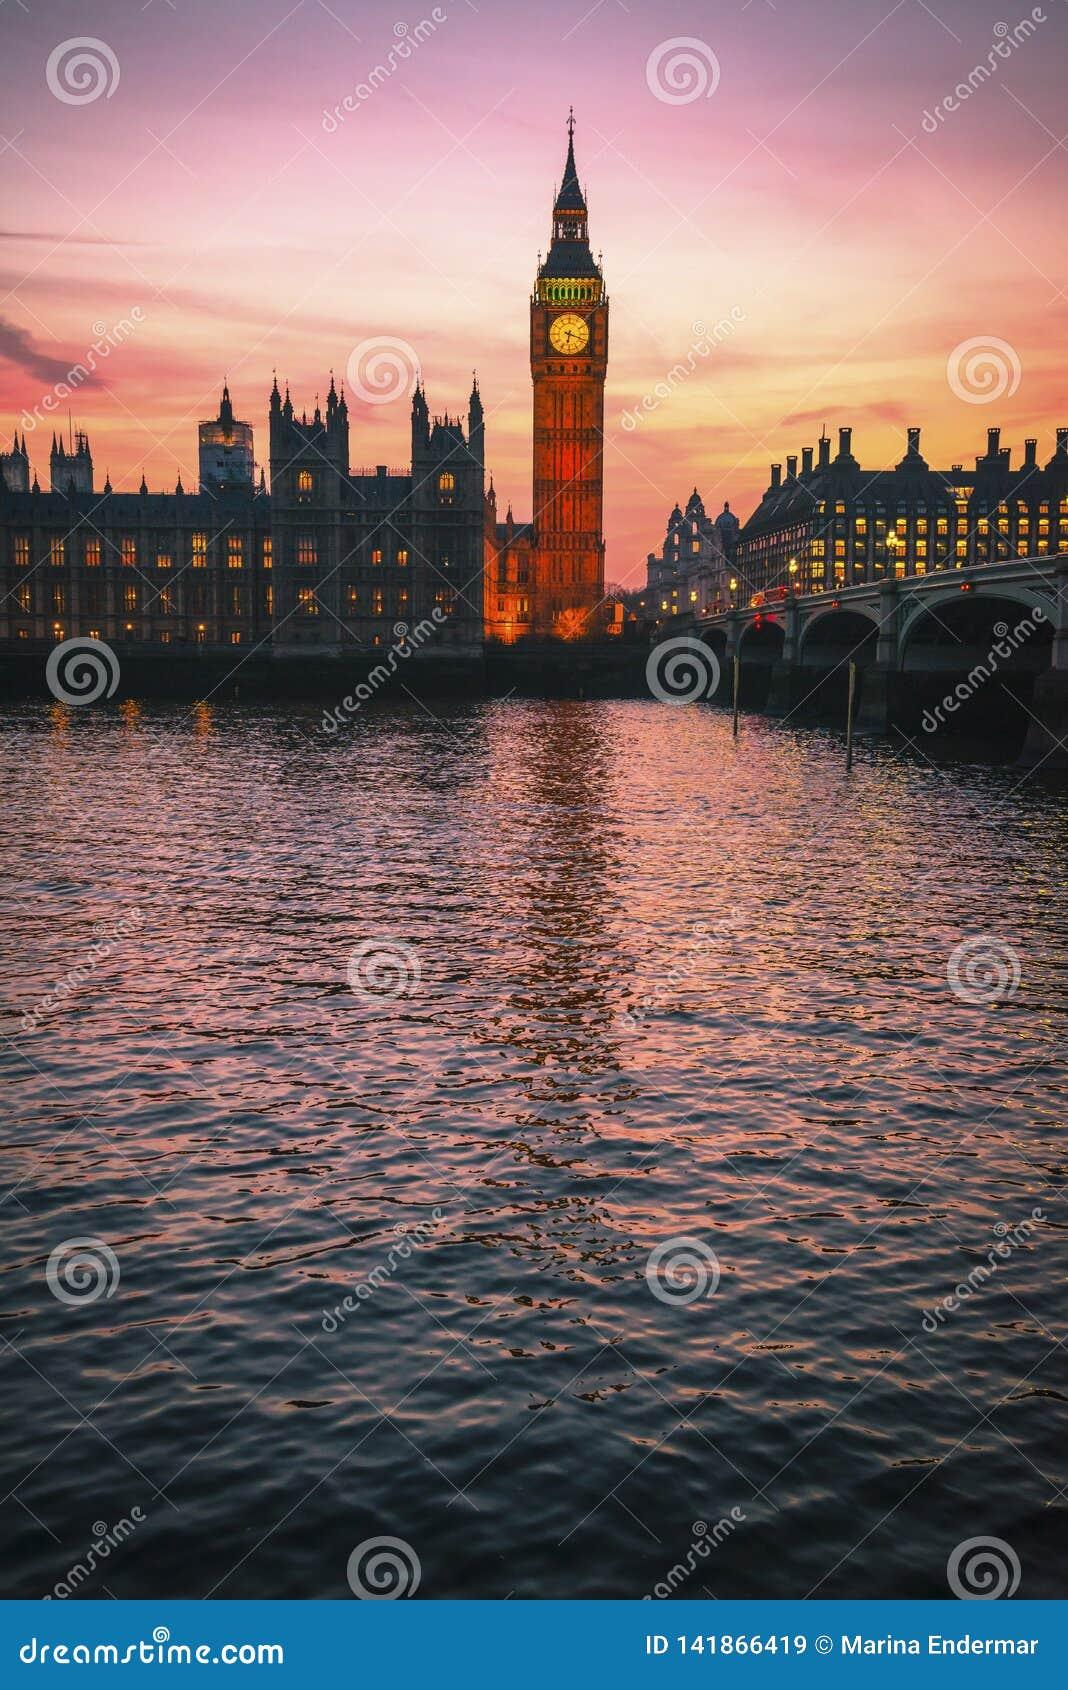 Big Ben e casas do parlamento, Londres, Reino Unido